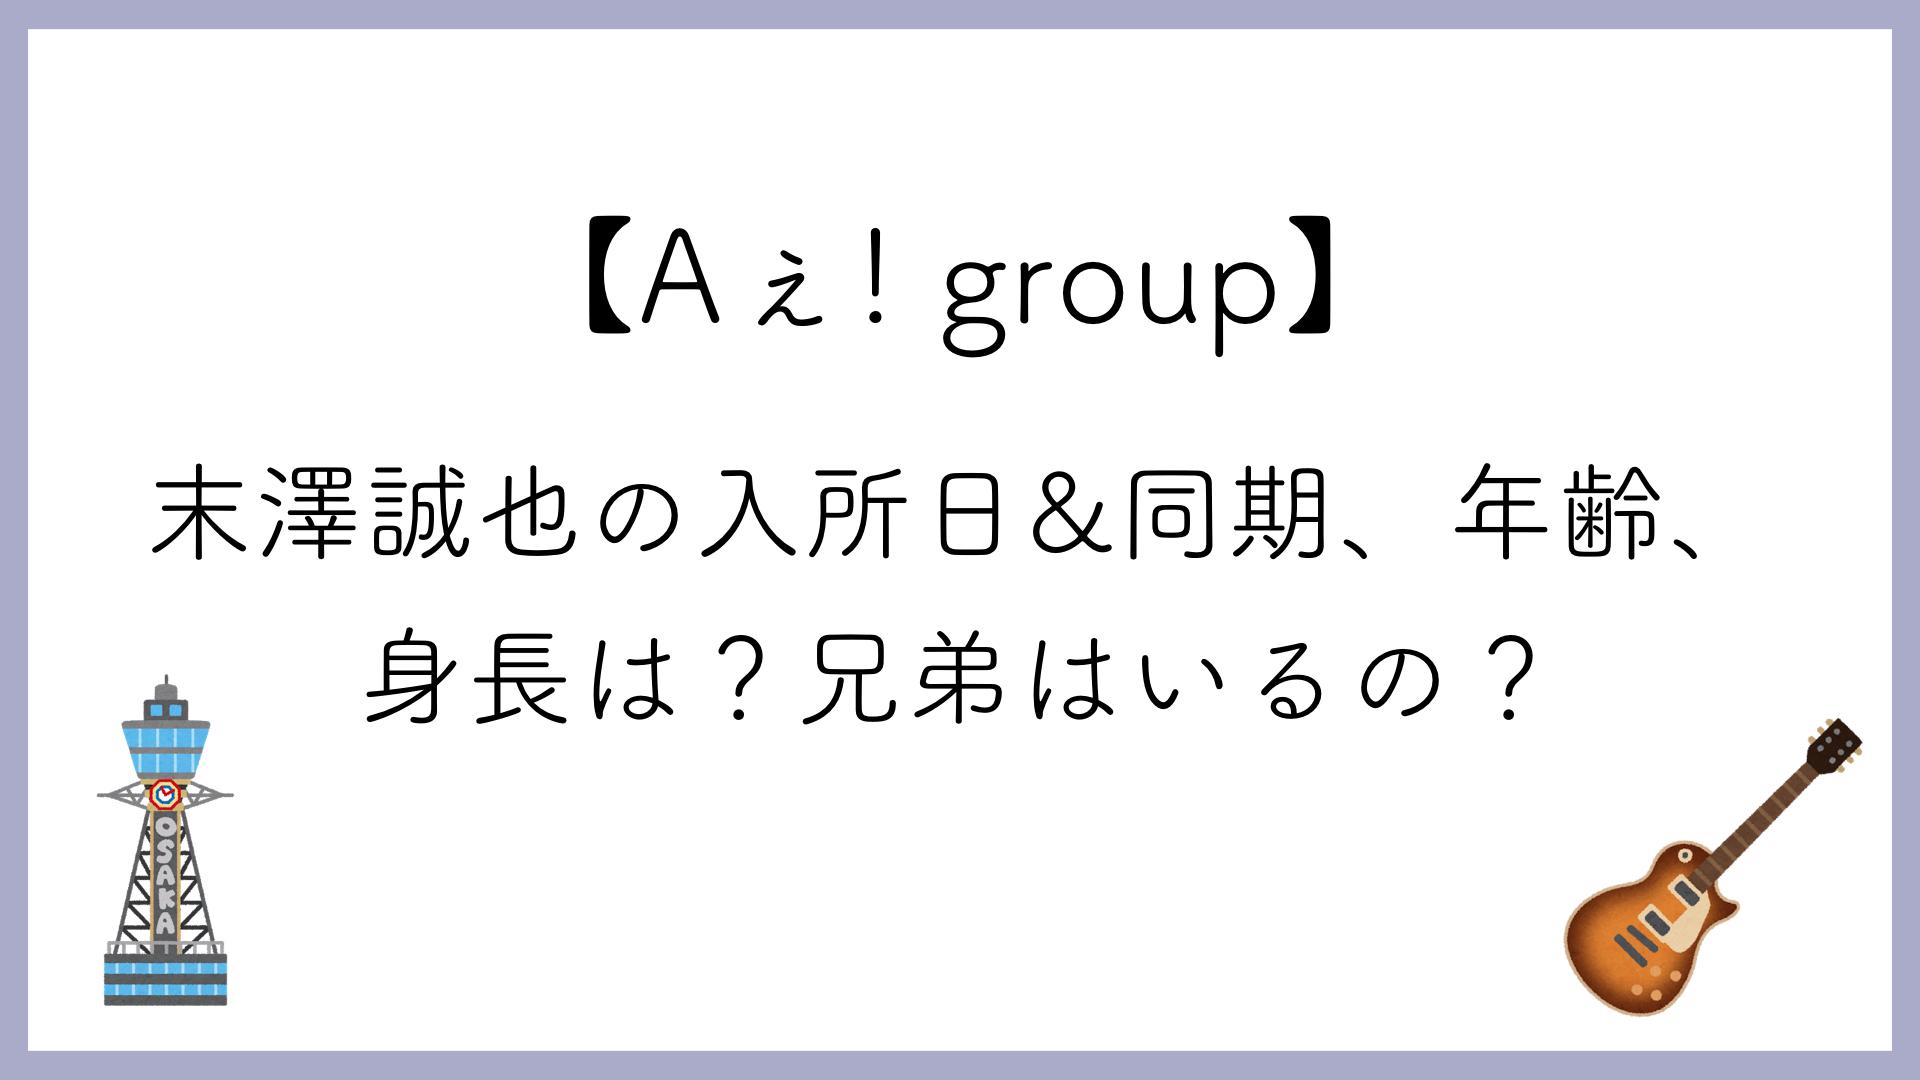 【Aぇ! group】末澤誠也の入所日&同期、年齢、身長は?兄弟はいるの?